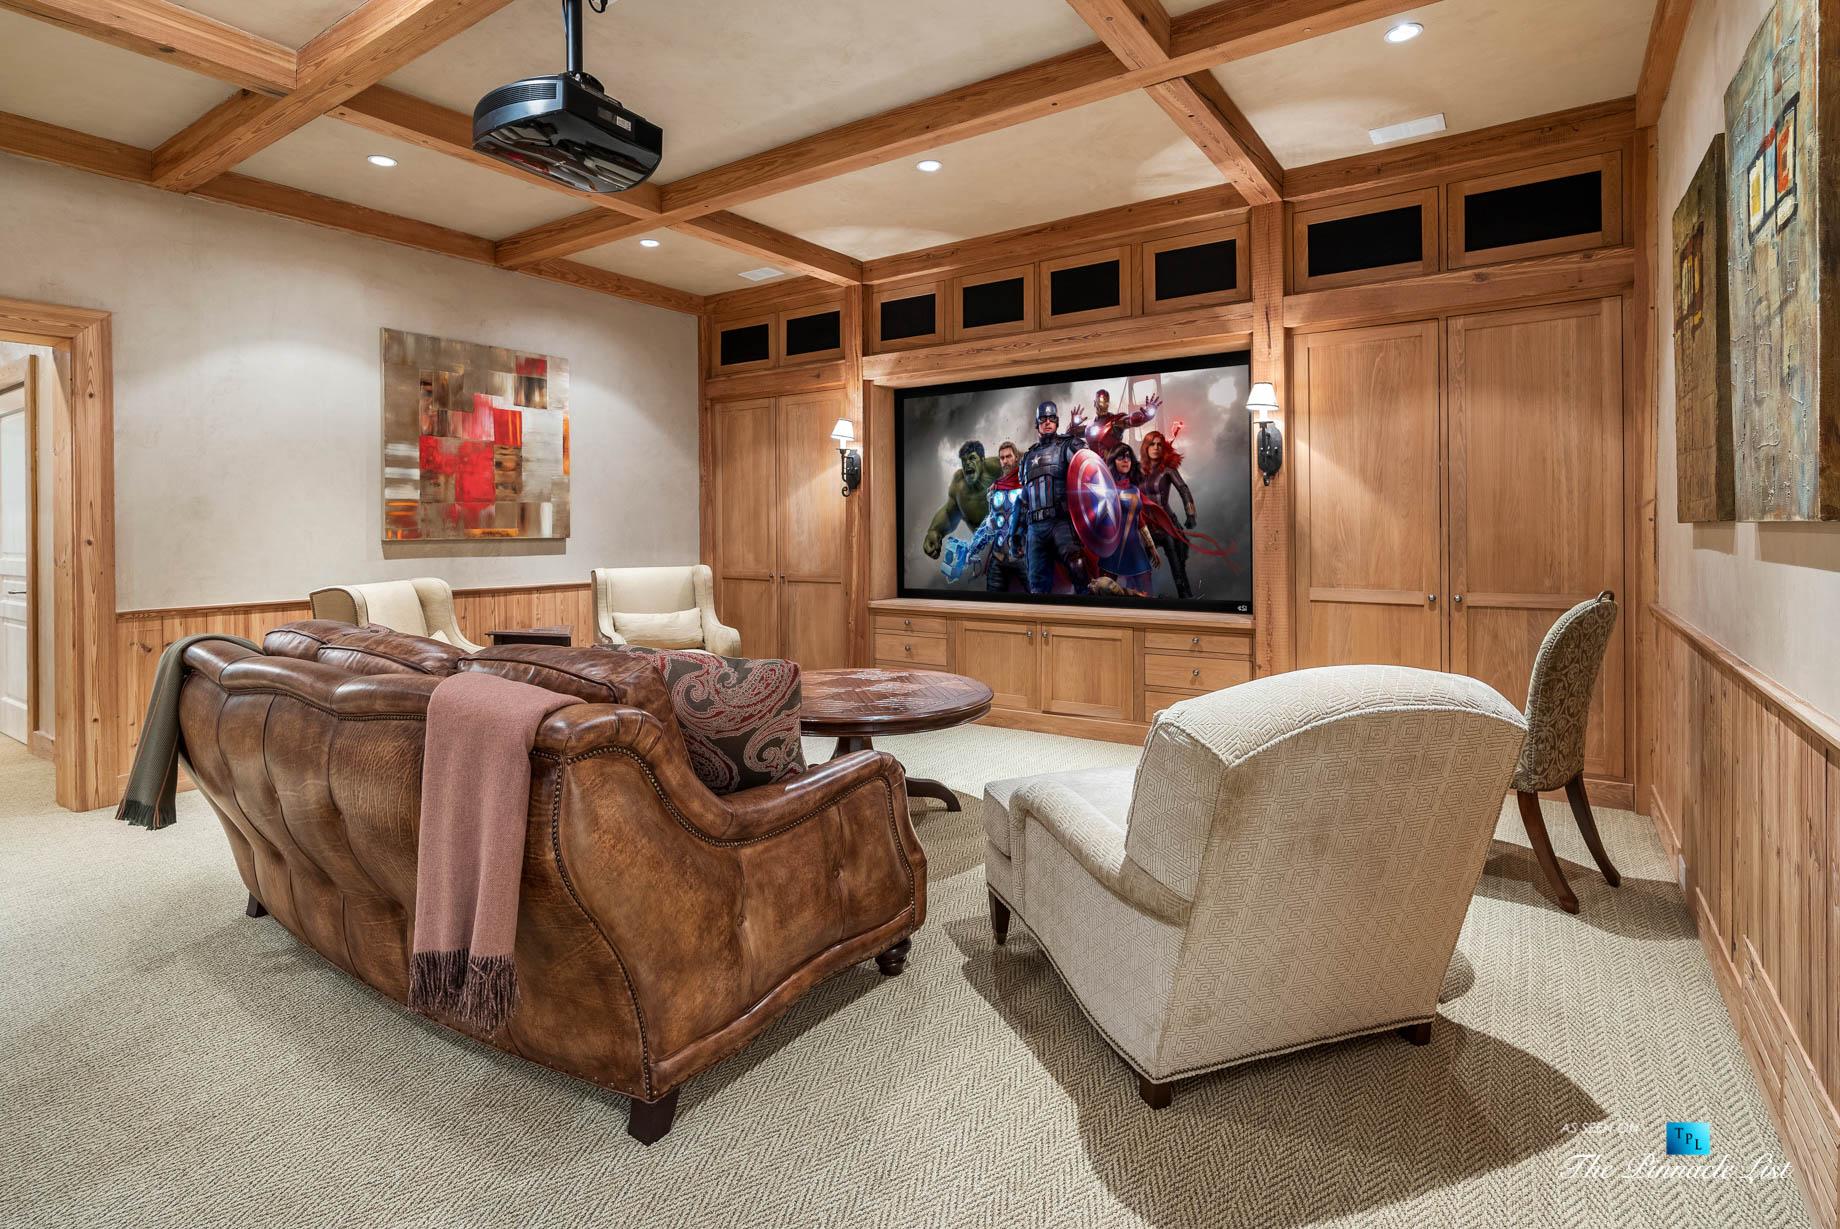 439 Blackland Rd NW, Atlanta, GA, USA - Theatre Room - Luxury Real Estate - Tuxedo Park Mediterranean Mansion Home